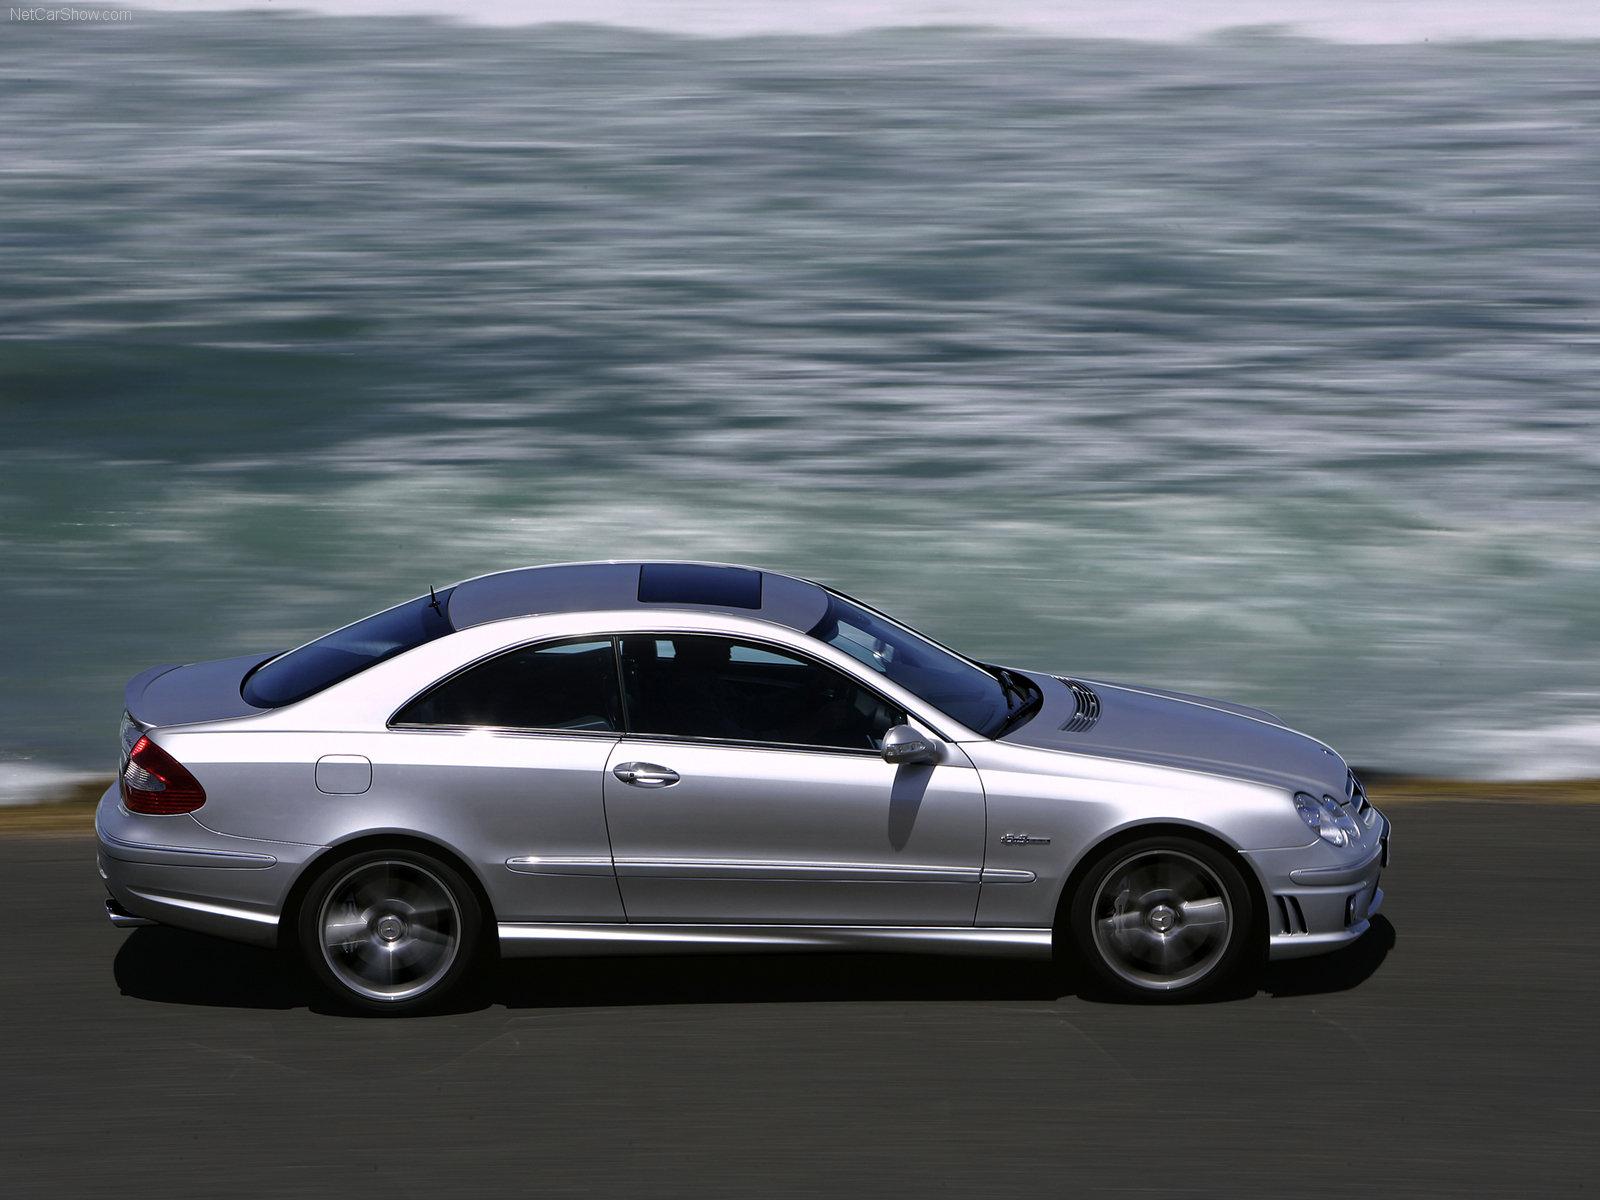 Mercedes benz clk amg photos photogallery with 38 pics for Mercedes benz clk 2006